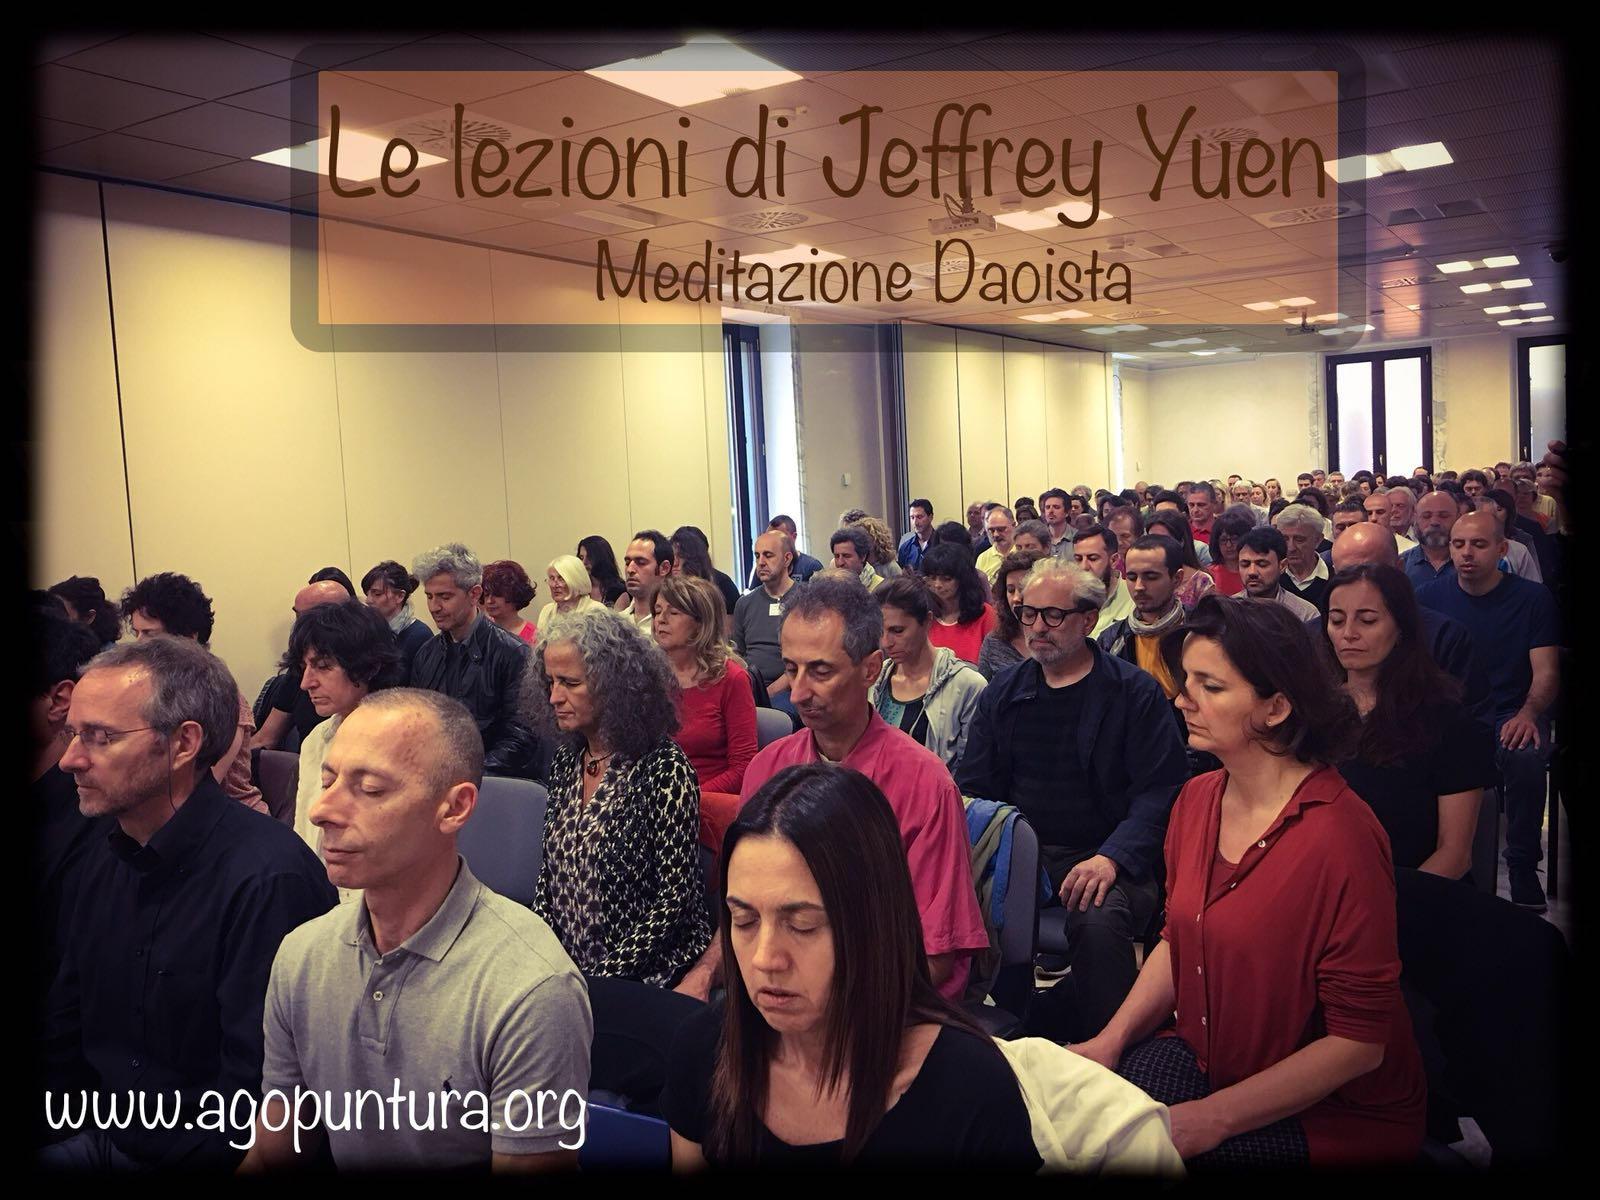 Seminari del Maestro Jeffrey Yuen 2018